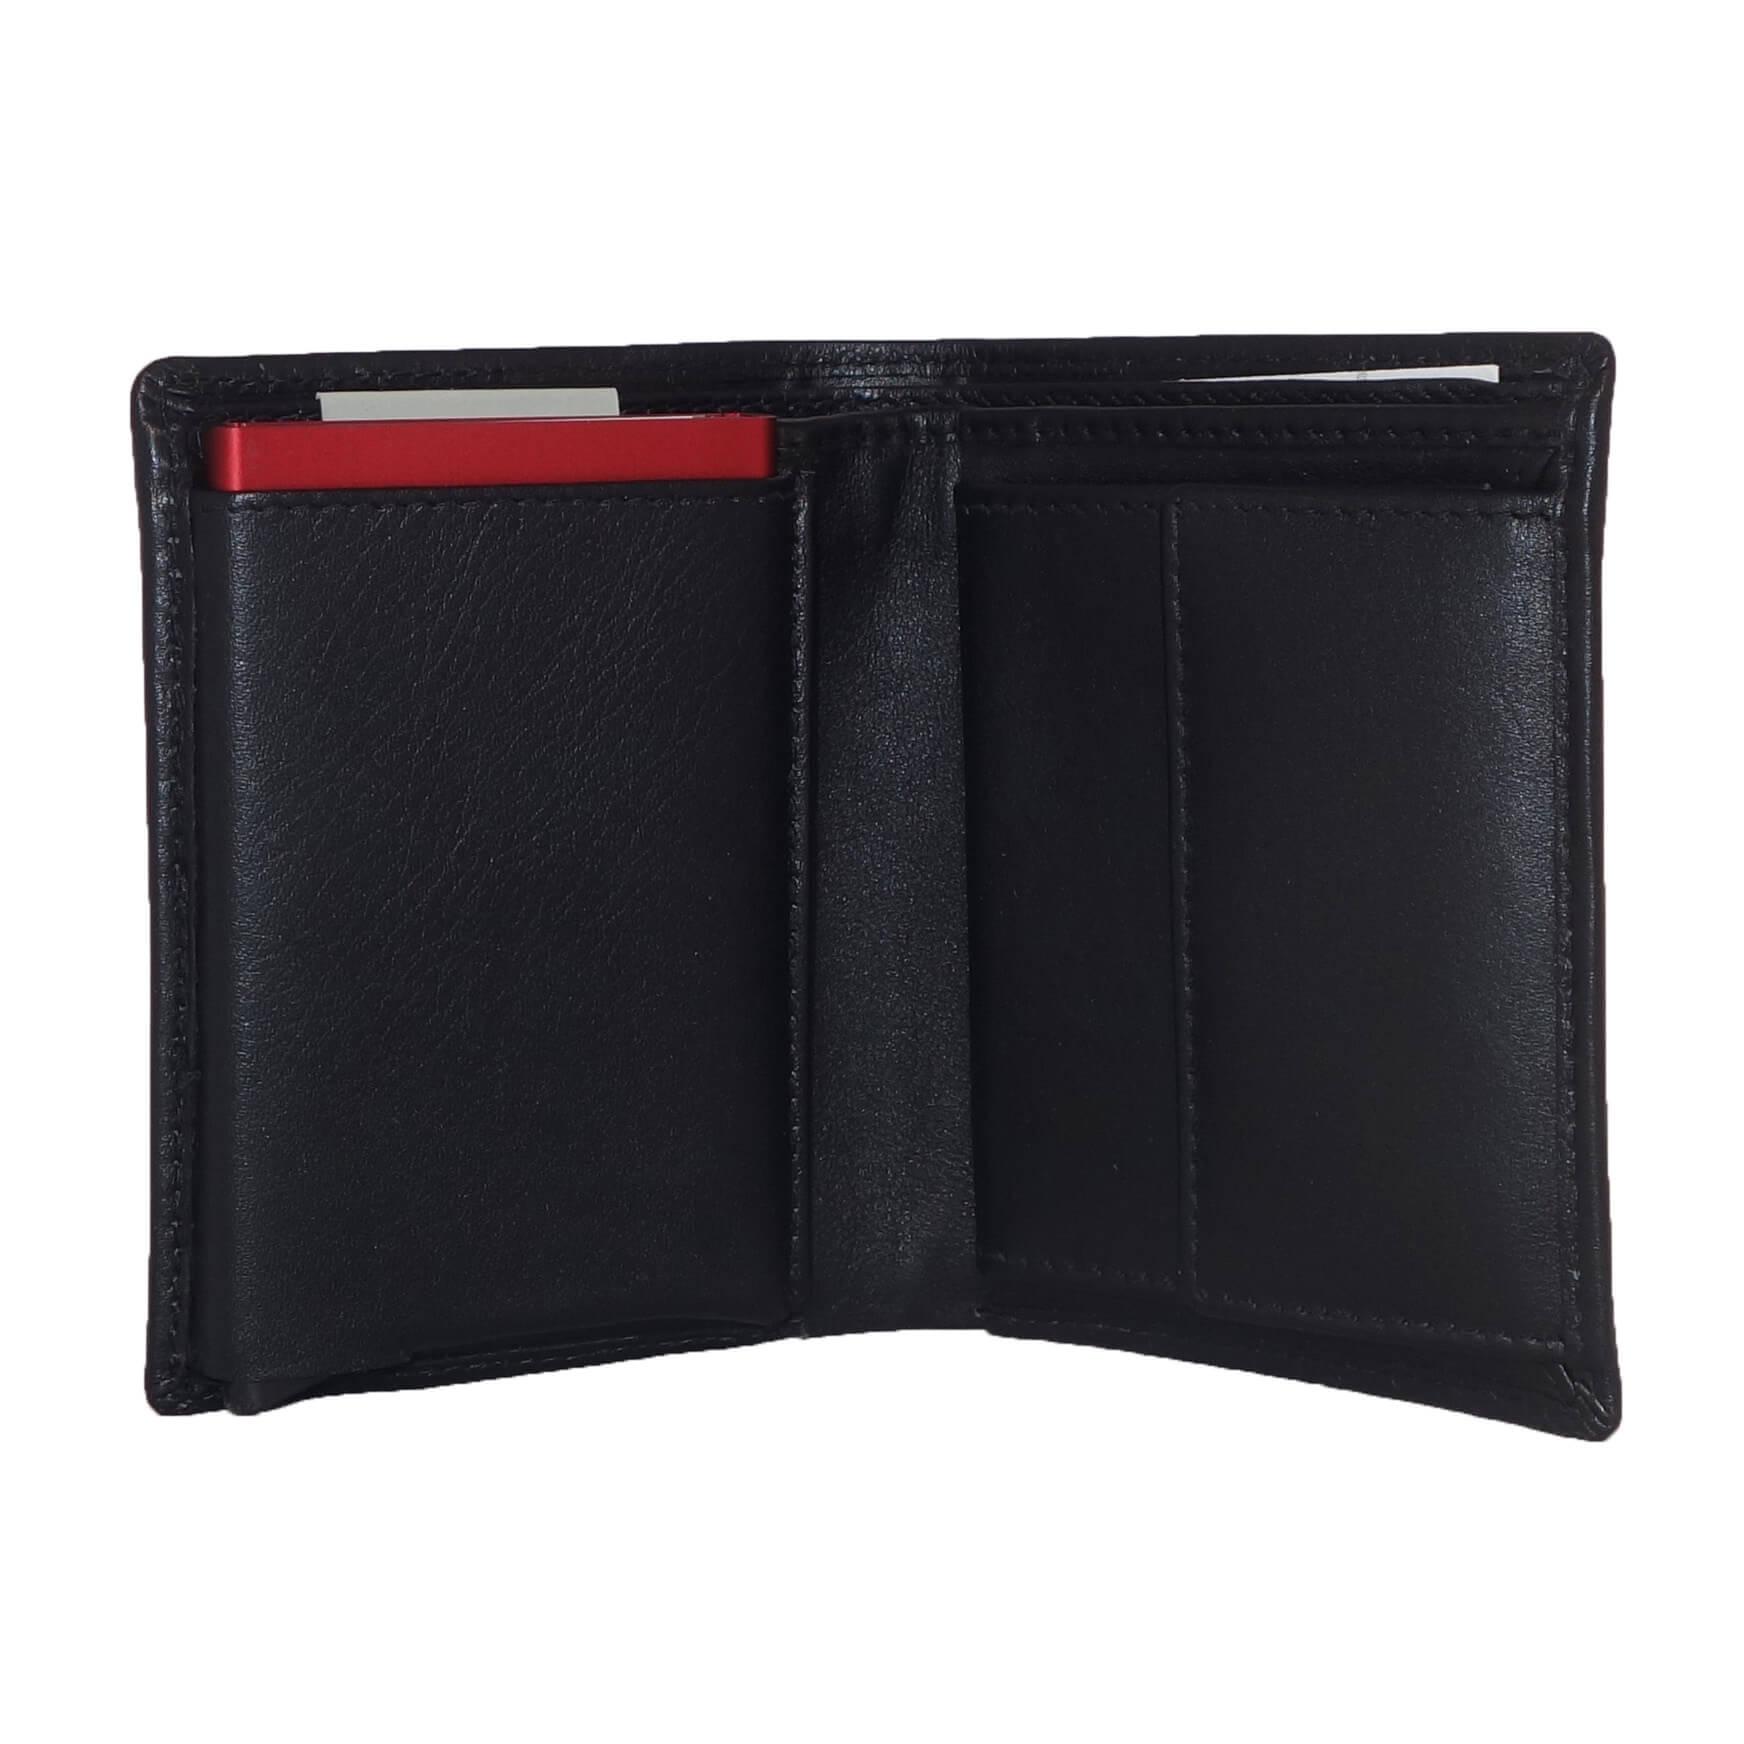 e788e07ee30 ... Leather Design Portemonnee met Secrid Cardprotector Vak Zwart-7334 ...